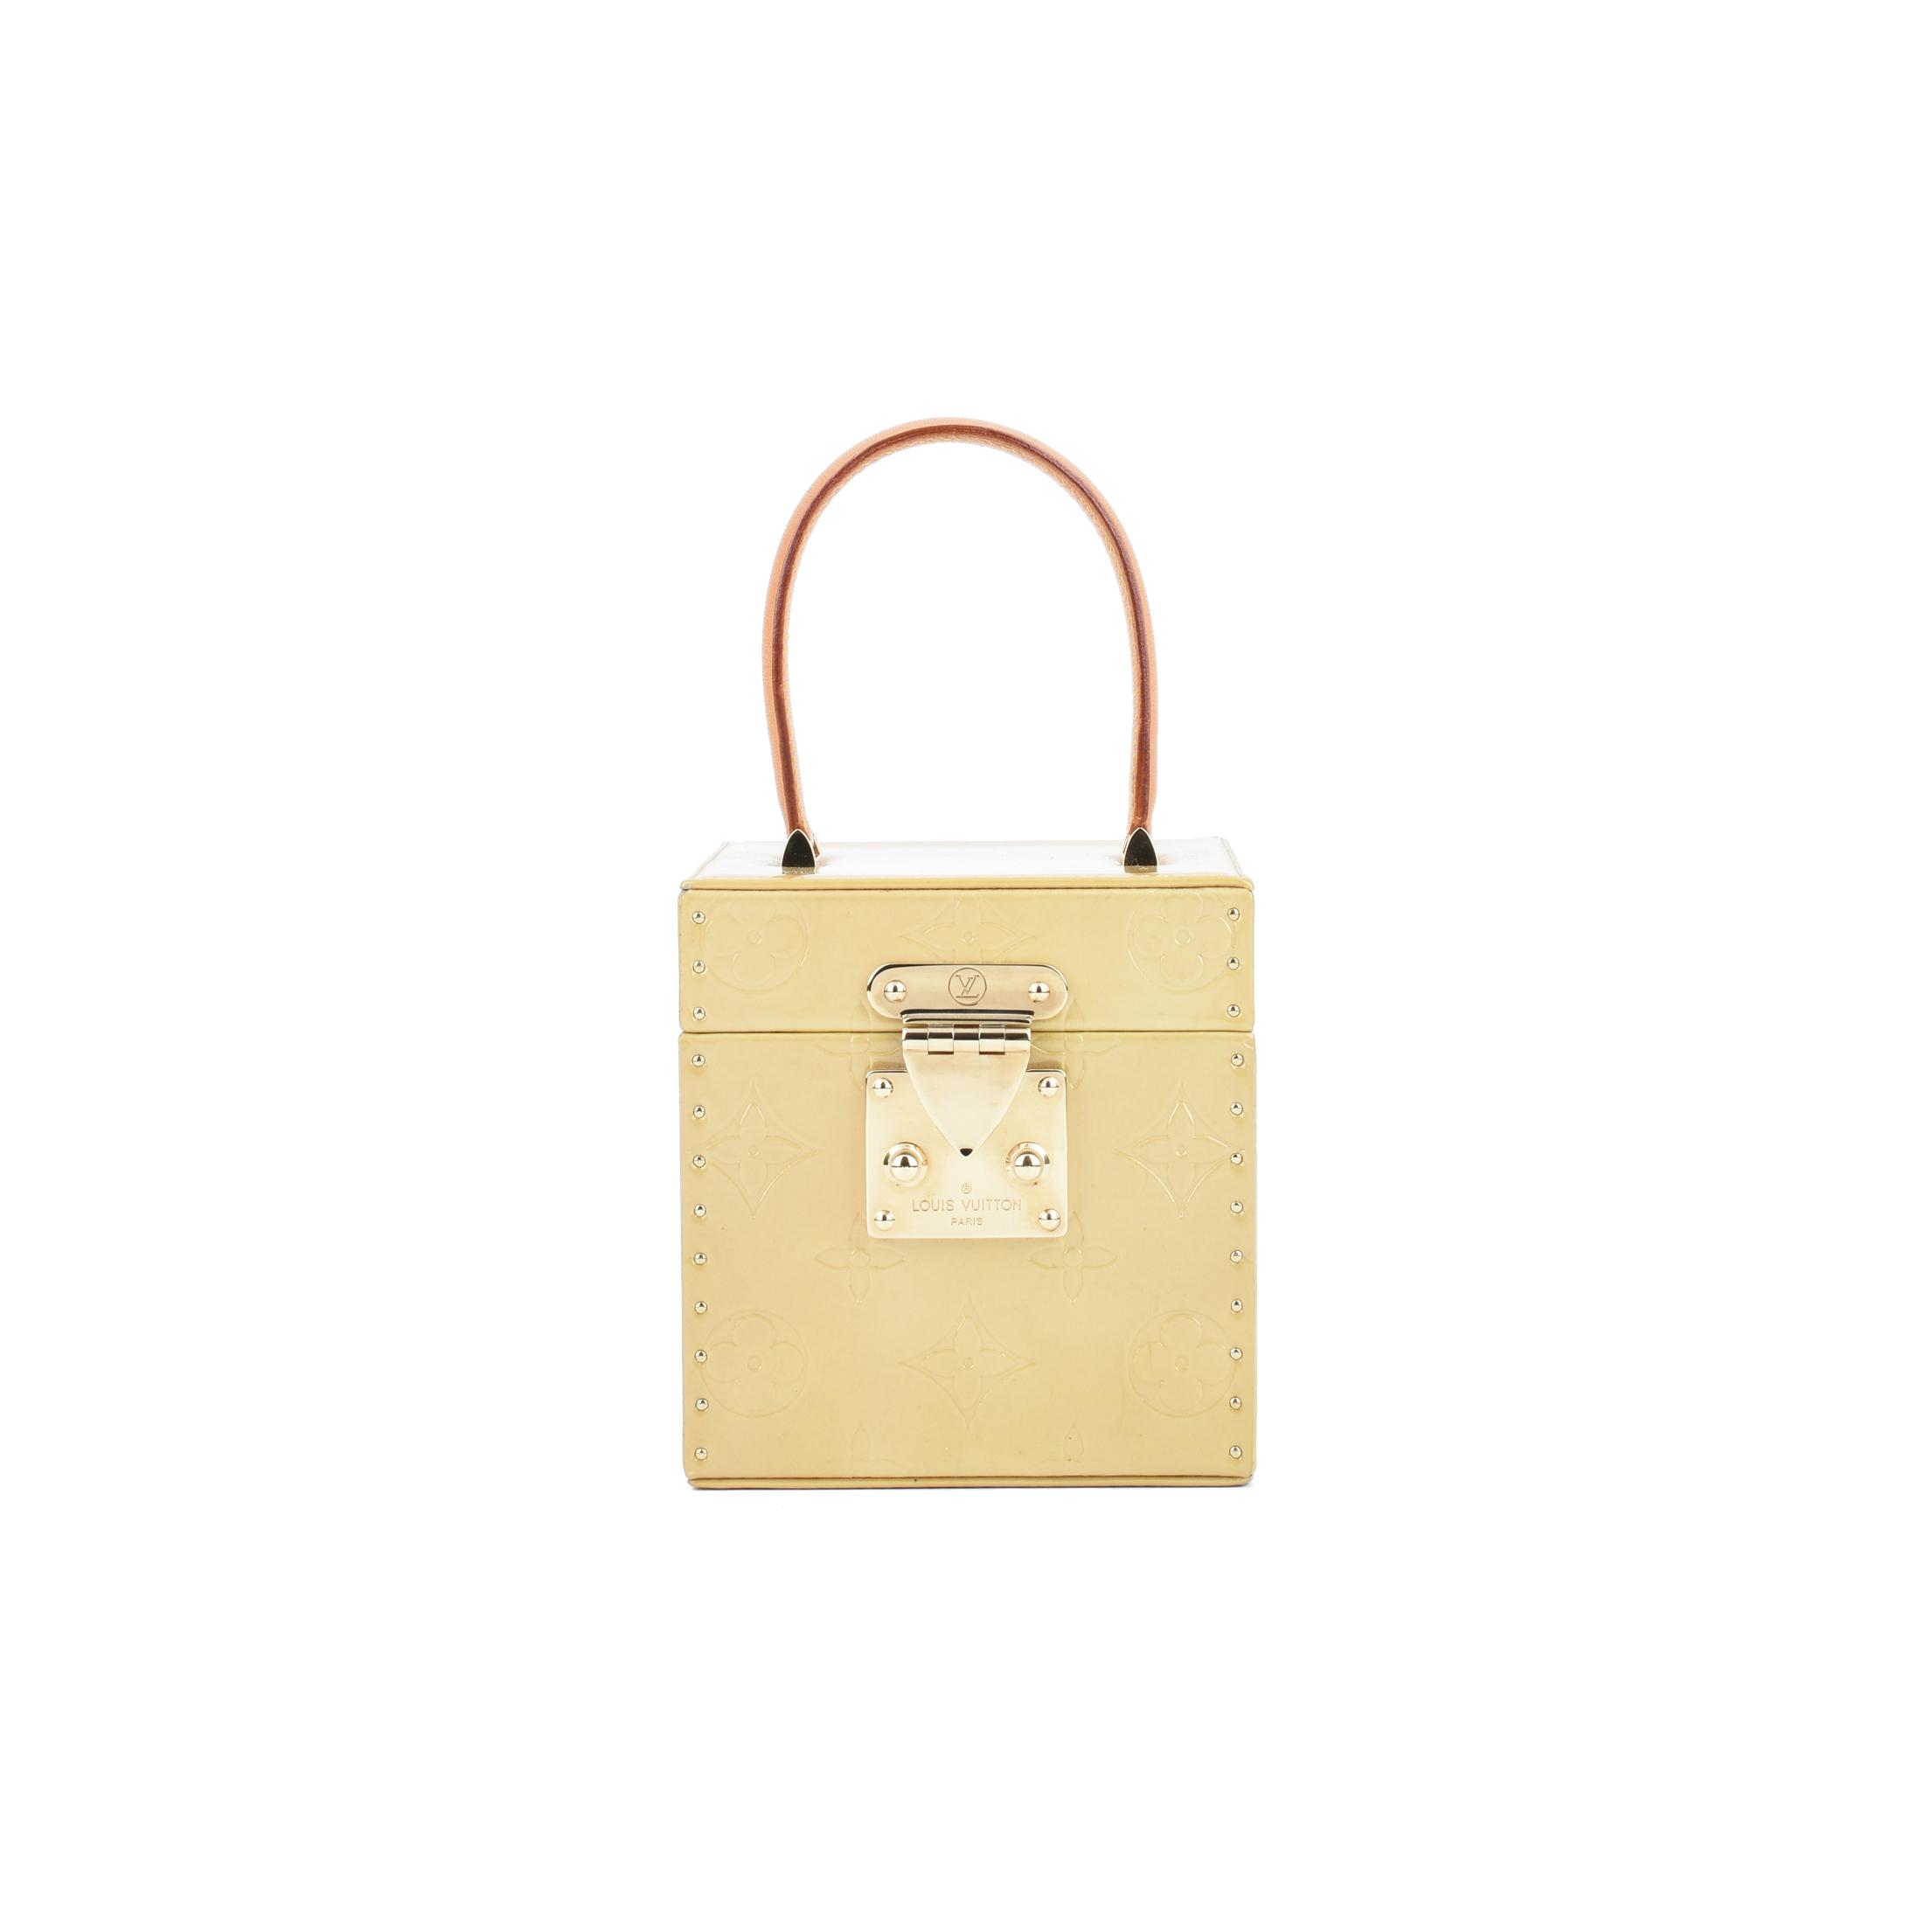 ab3dd620ee1d Authentic Second Hand Louis Vuitton Vernis Bleecker Vanity Case  (PSS-075-00075)